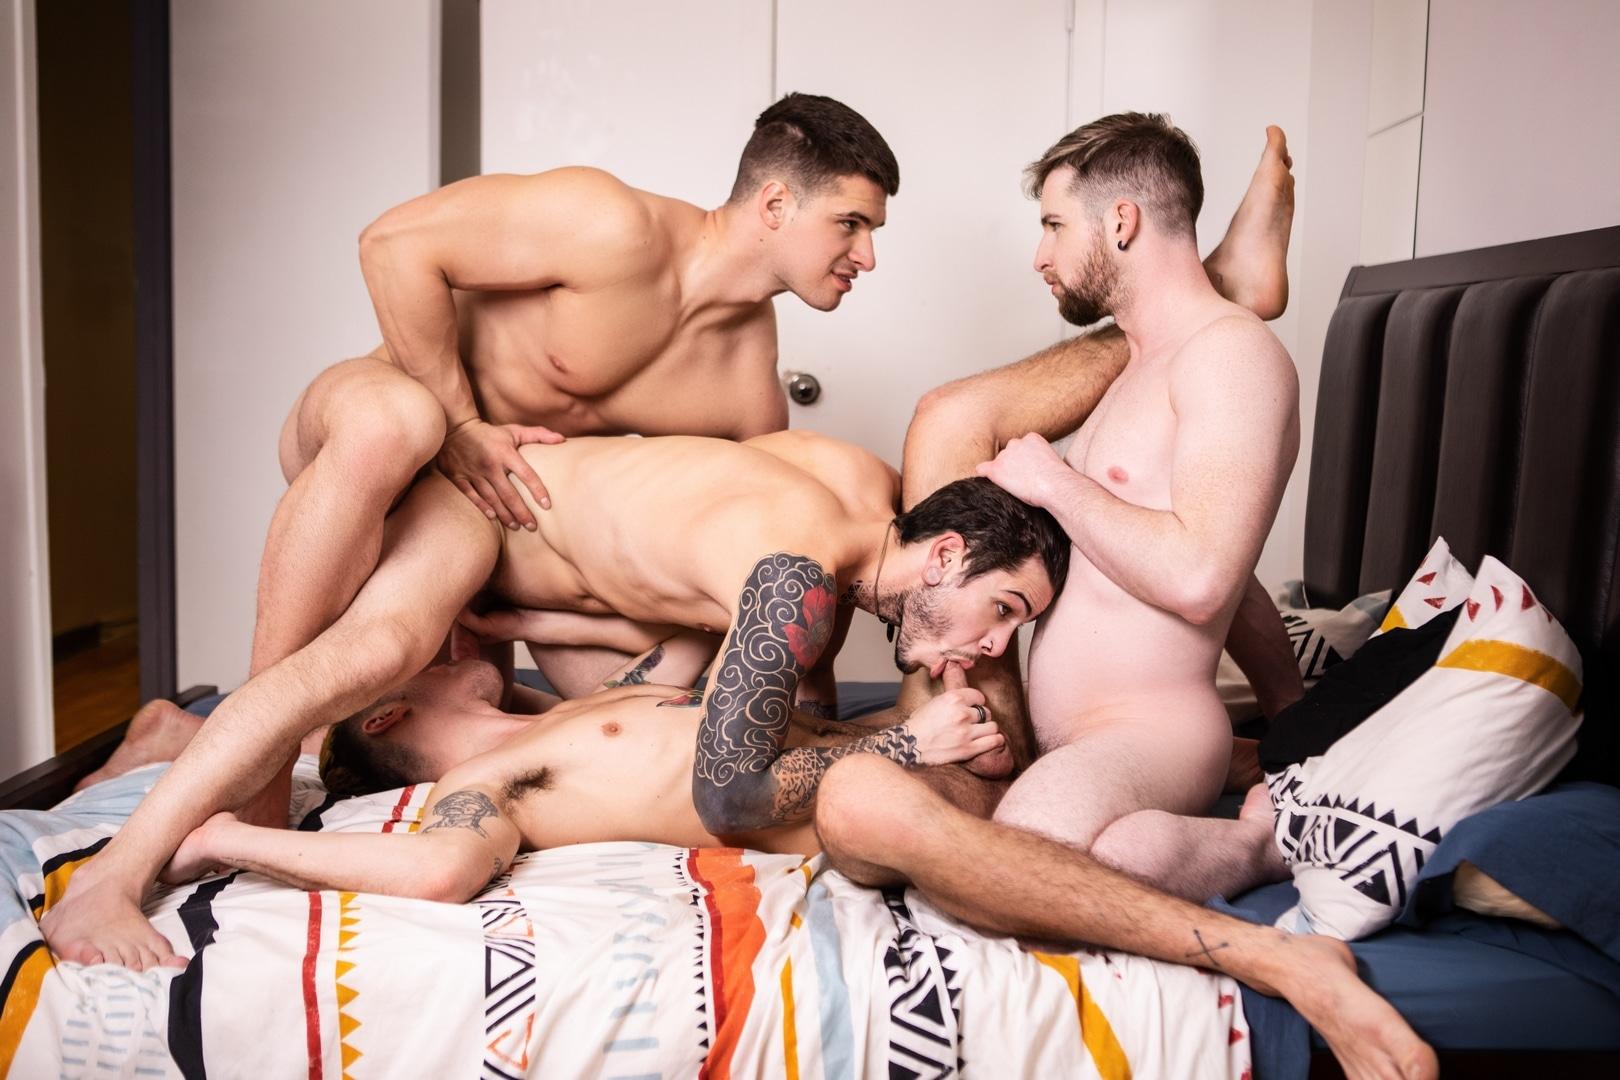 Foursome porn pics Malik Delgaty Gay Foursome Porn Gay Porn Pics